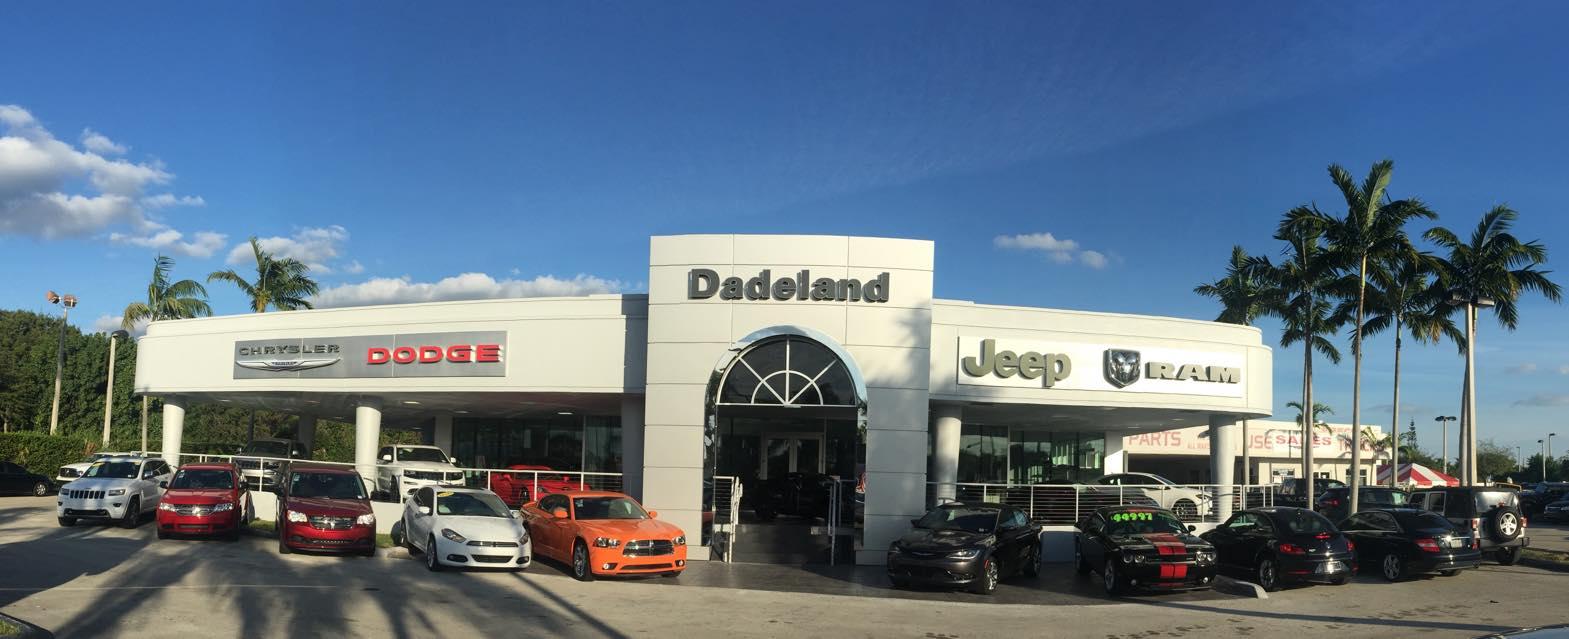 Dadeland Dodge Chrysler Jeep RAM 16501 S Dixie Hwy, Miami, FL 33157   YP.com